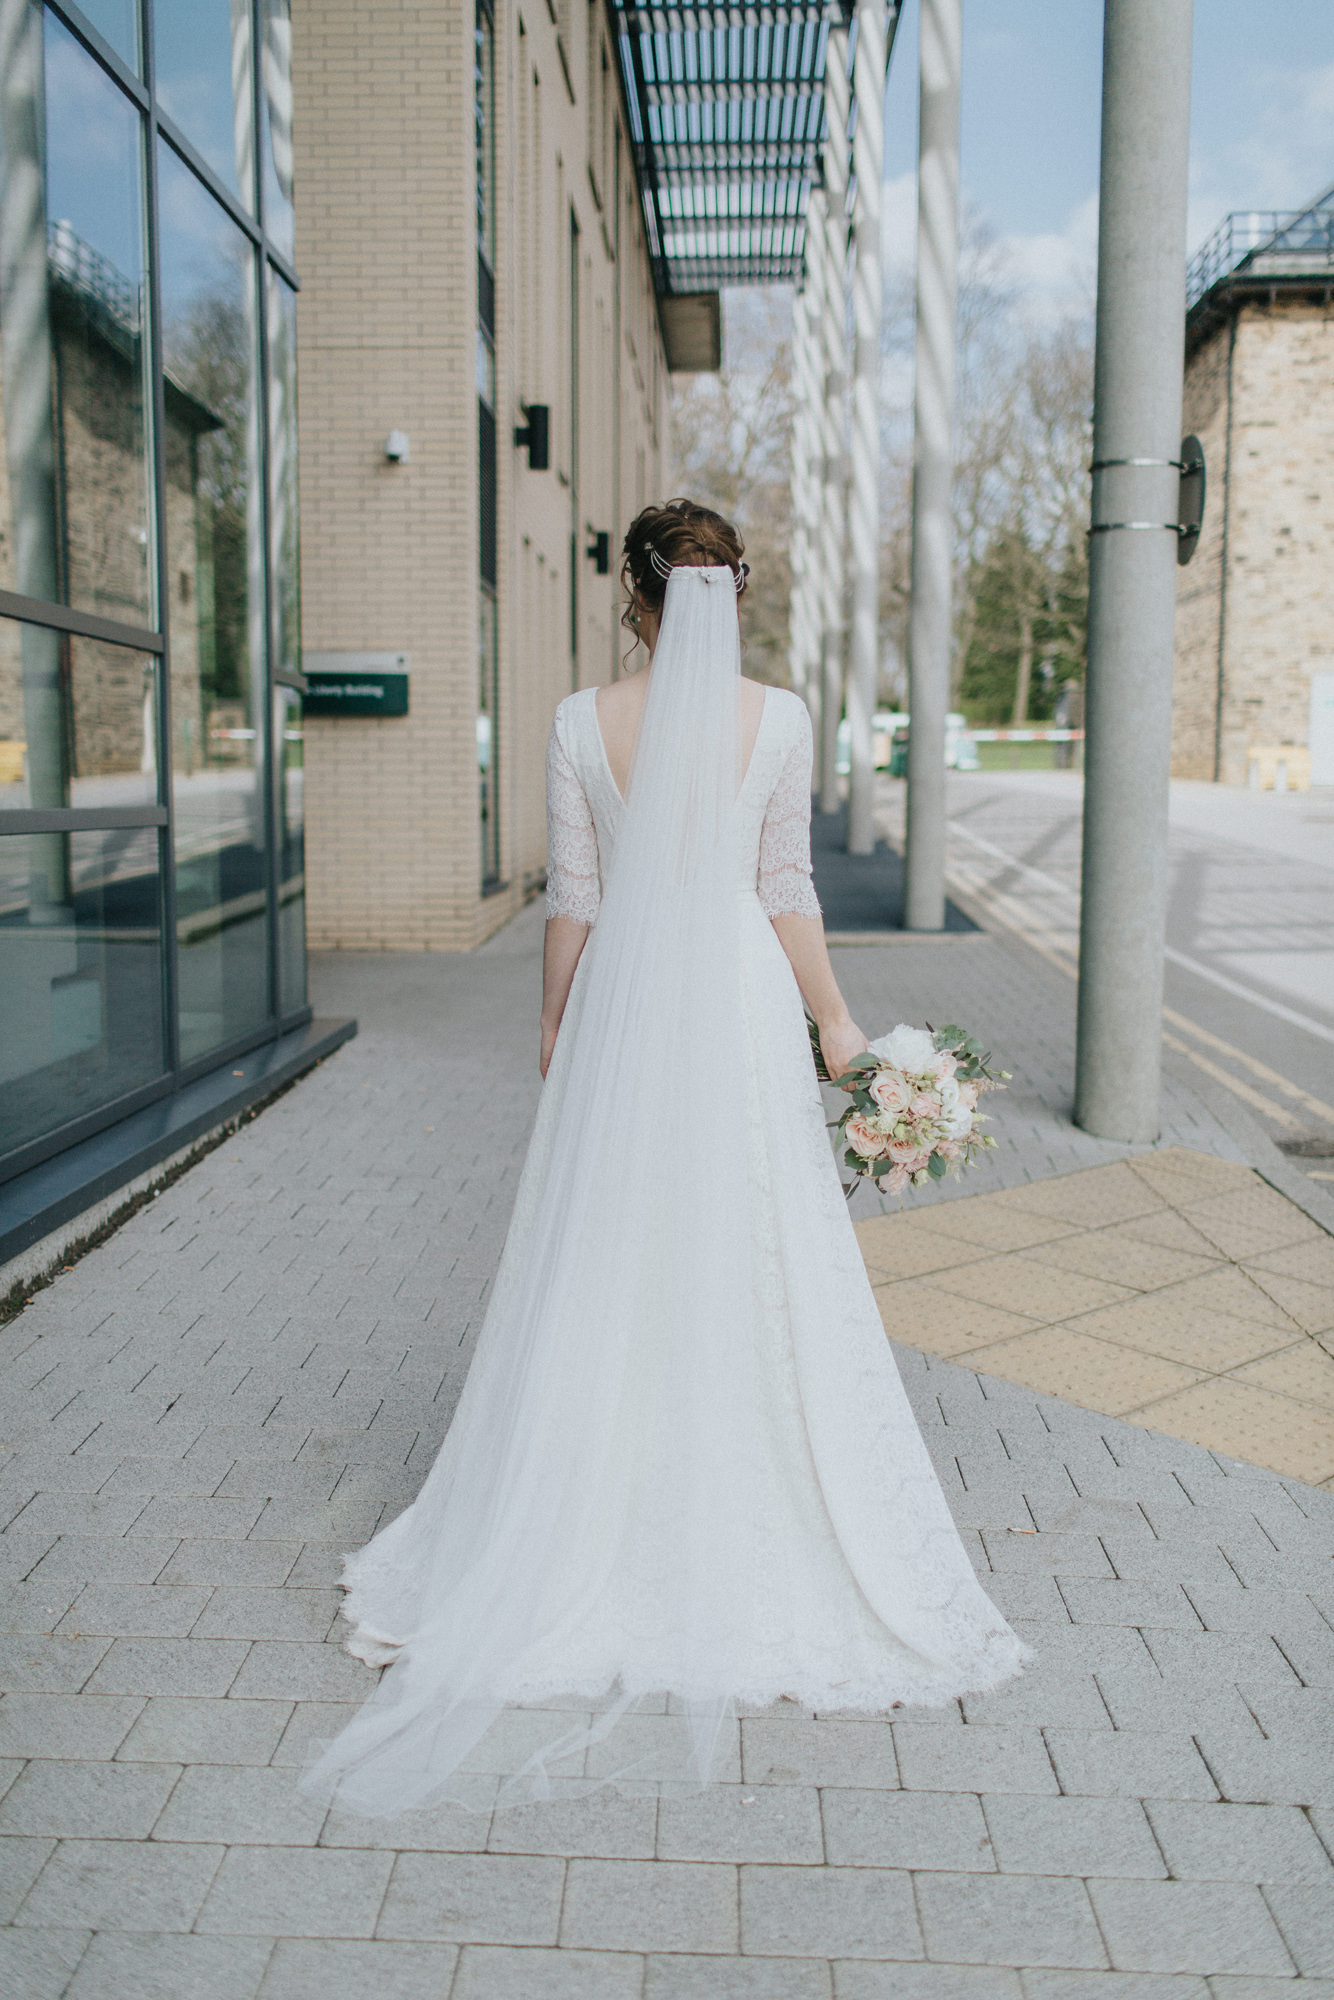 Kate-Beaumont-Lace-Flared-Dahlia-Gown-Leeds-Wedding-Bloom-Weddings-42.jpg